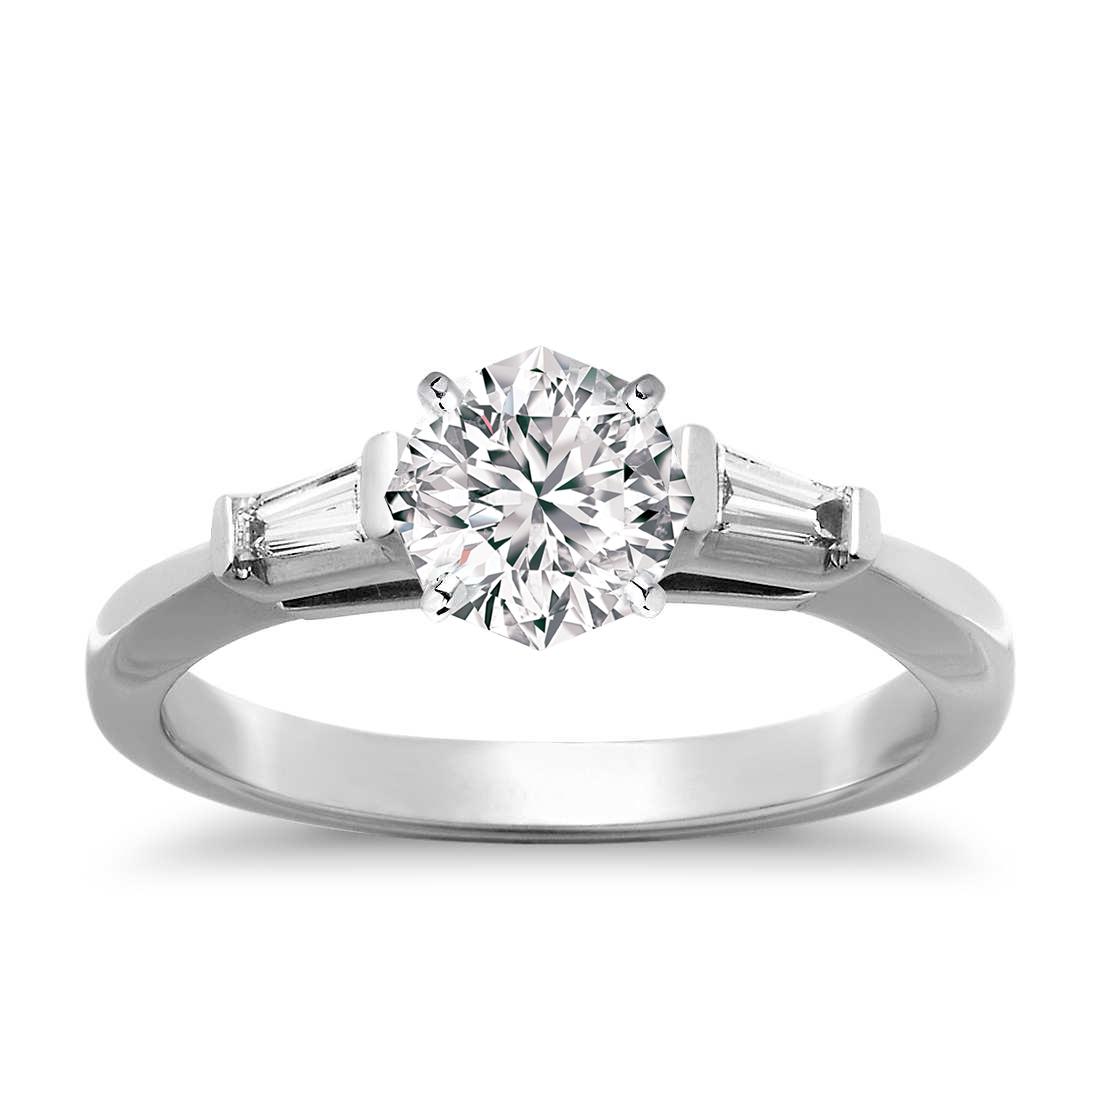 88-cut-tapered-baguette-ring.jpg